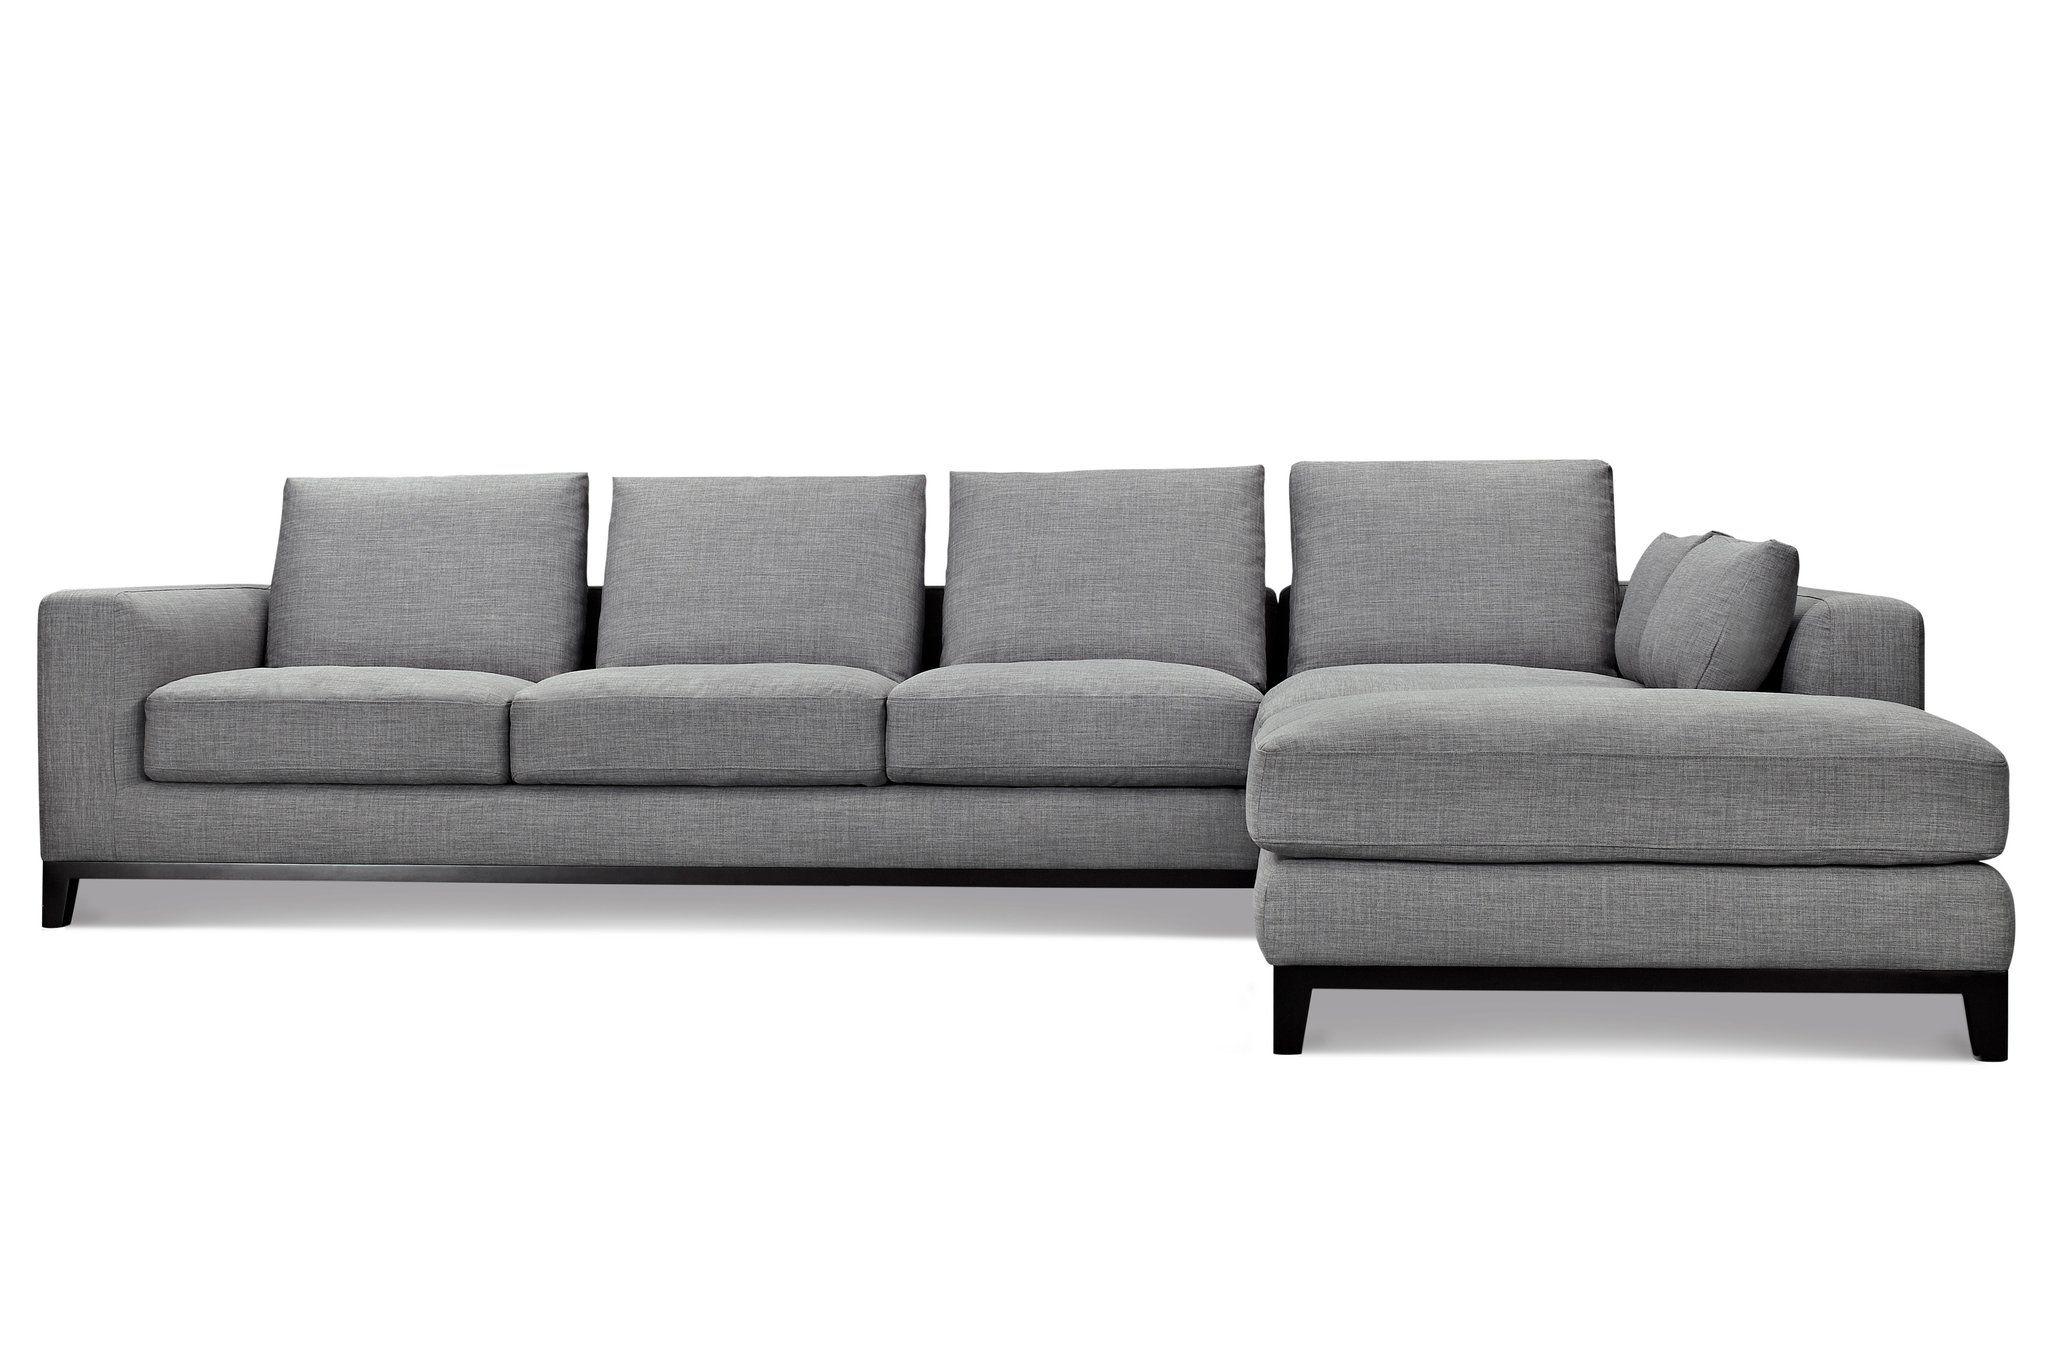 Terrific Kellan Sectional Sofa New Home Sectional Sofa Sofa Gamerscity Chair Design For Home Gamerscityorg